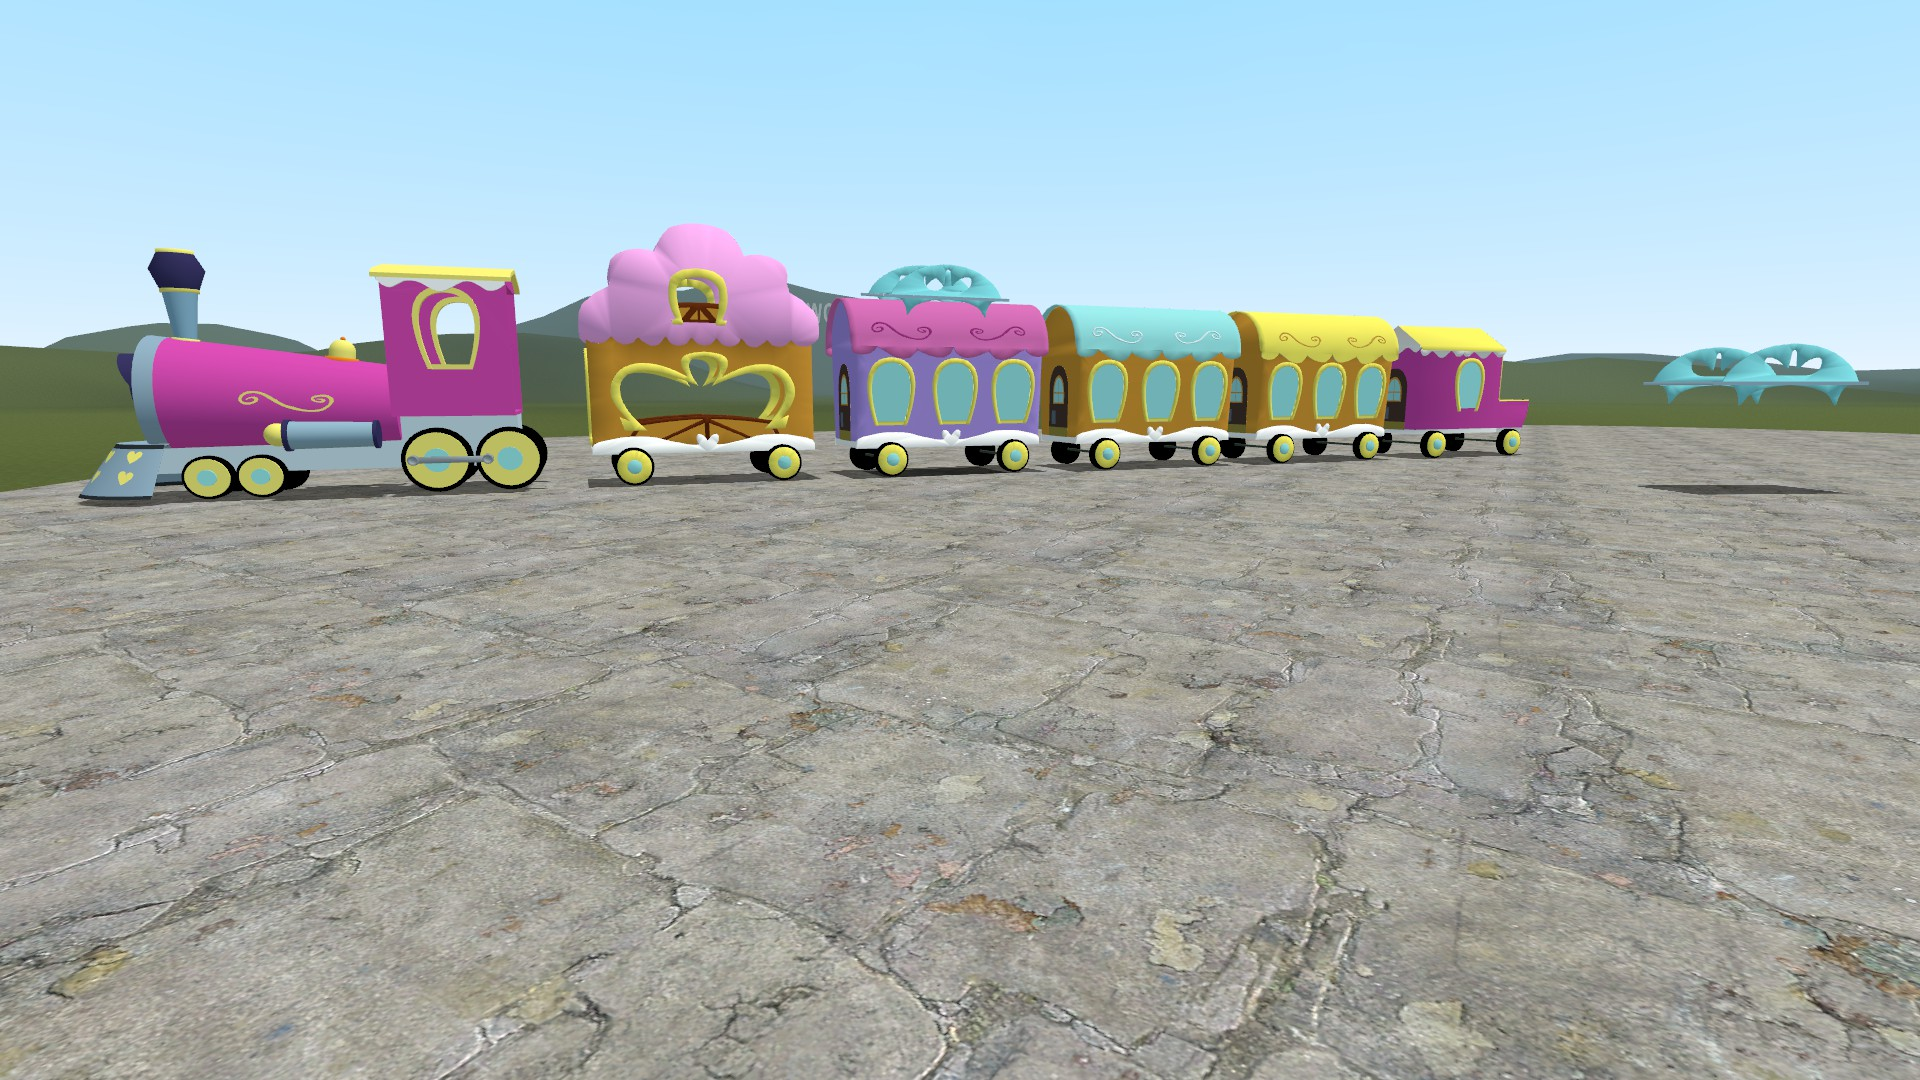 Michale: Gmod train models